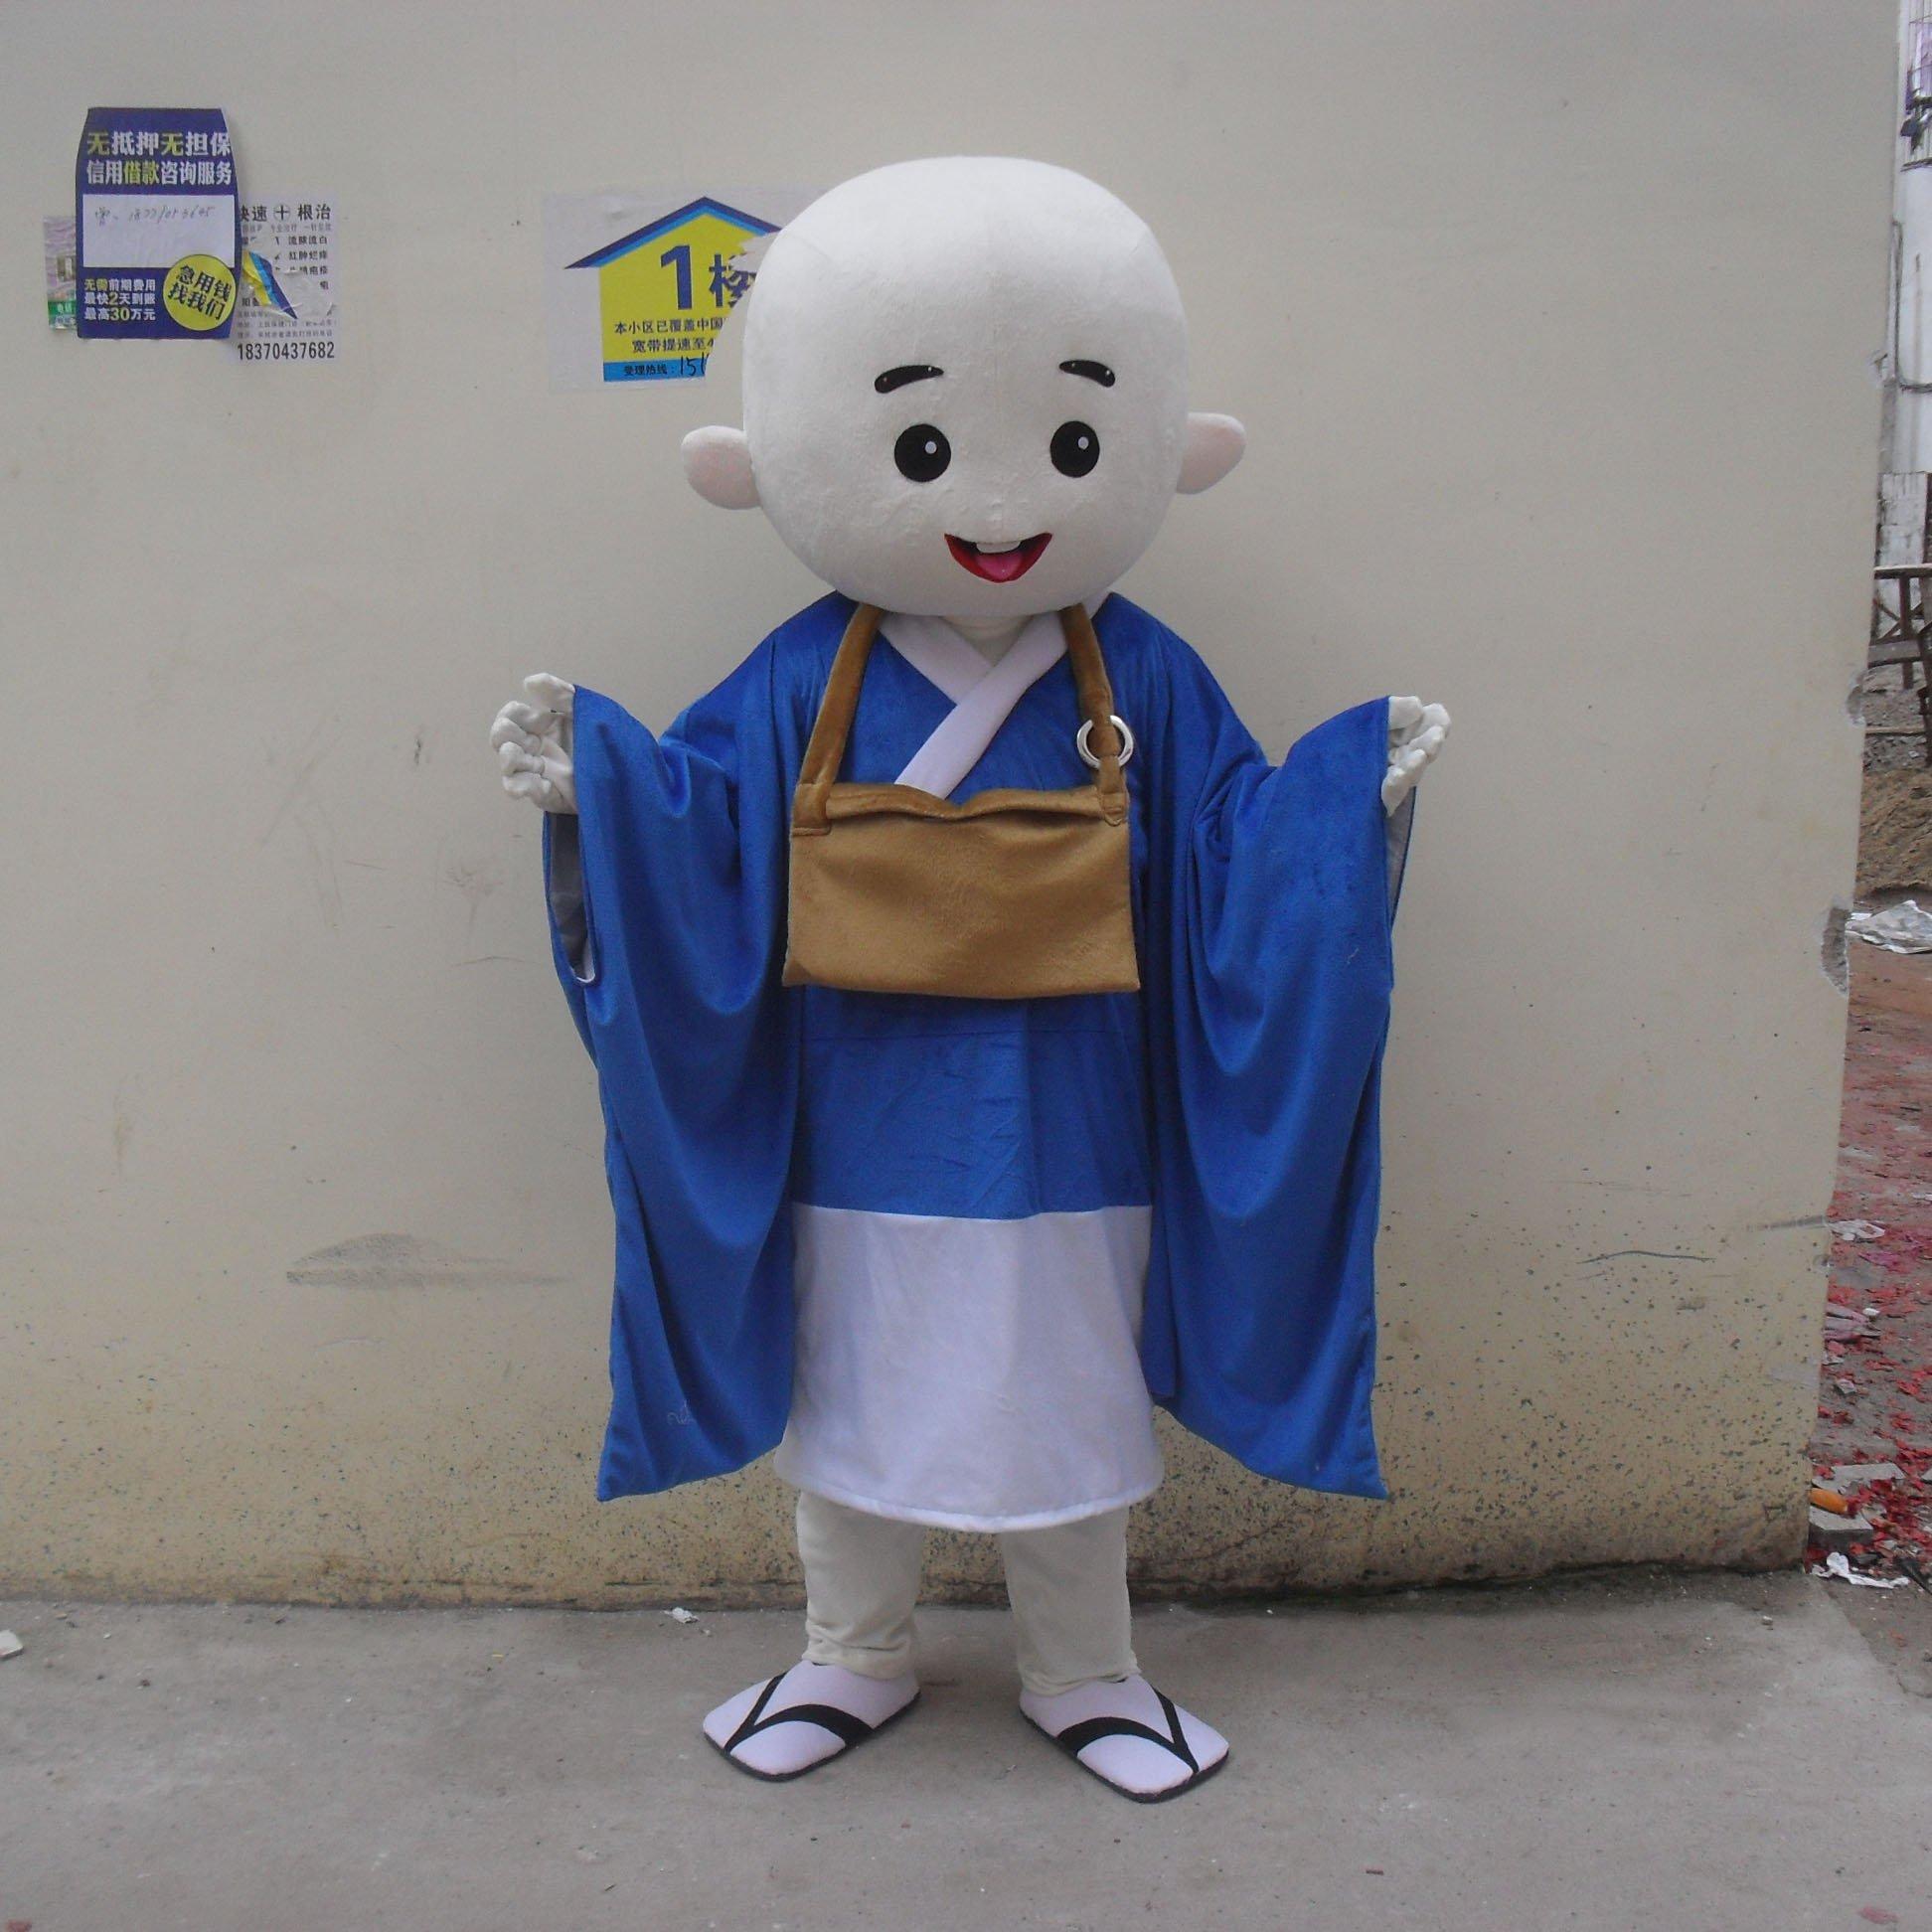 Cartoon Doll Clothing Cartoon Walking Doll Clothing Cartoon Show Clothing Cartoon Dolls Doll Clothing Monk Mascot Costume